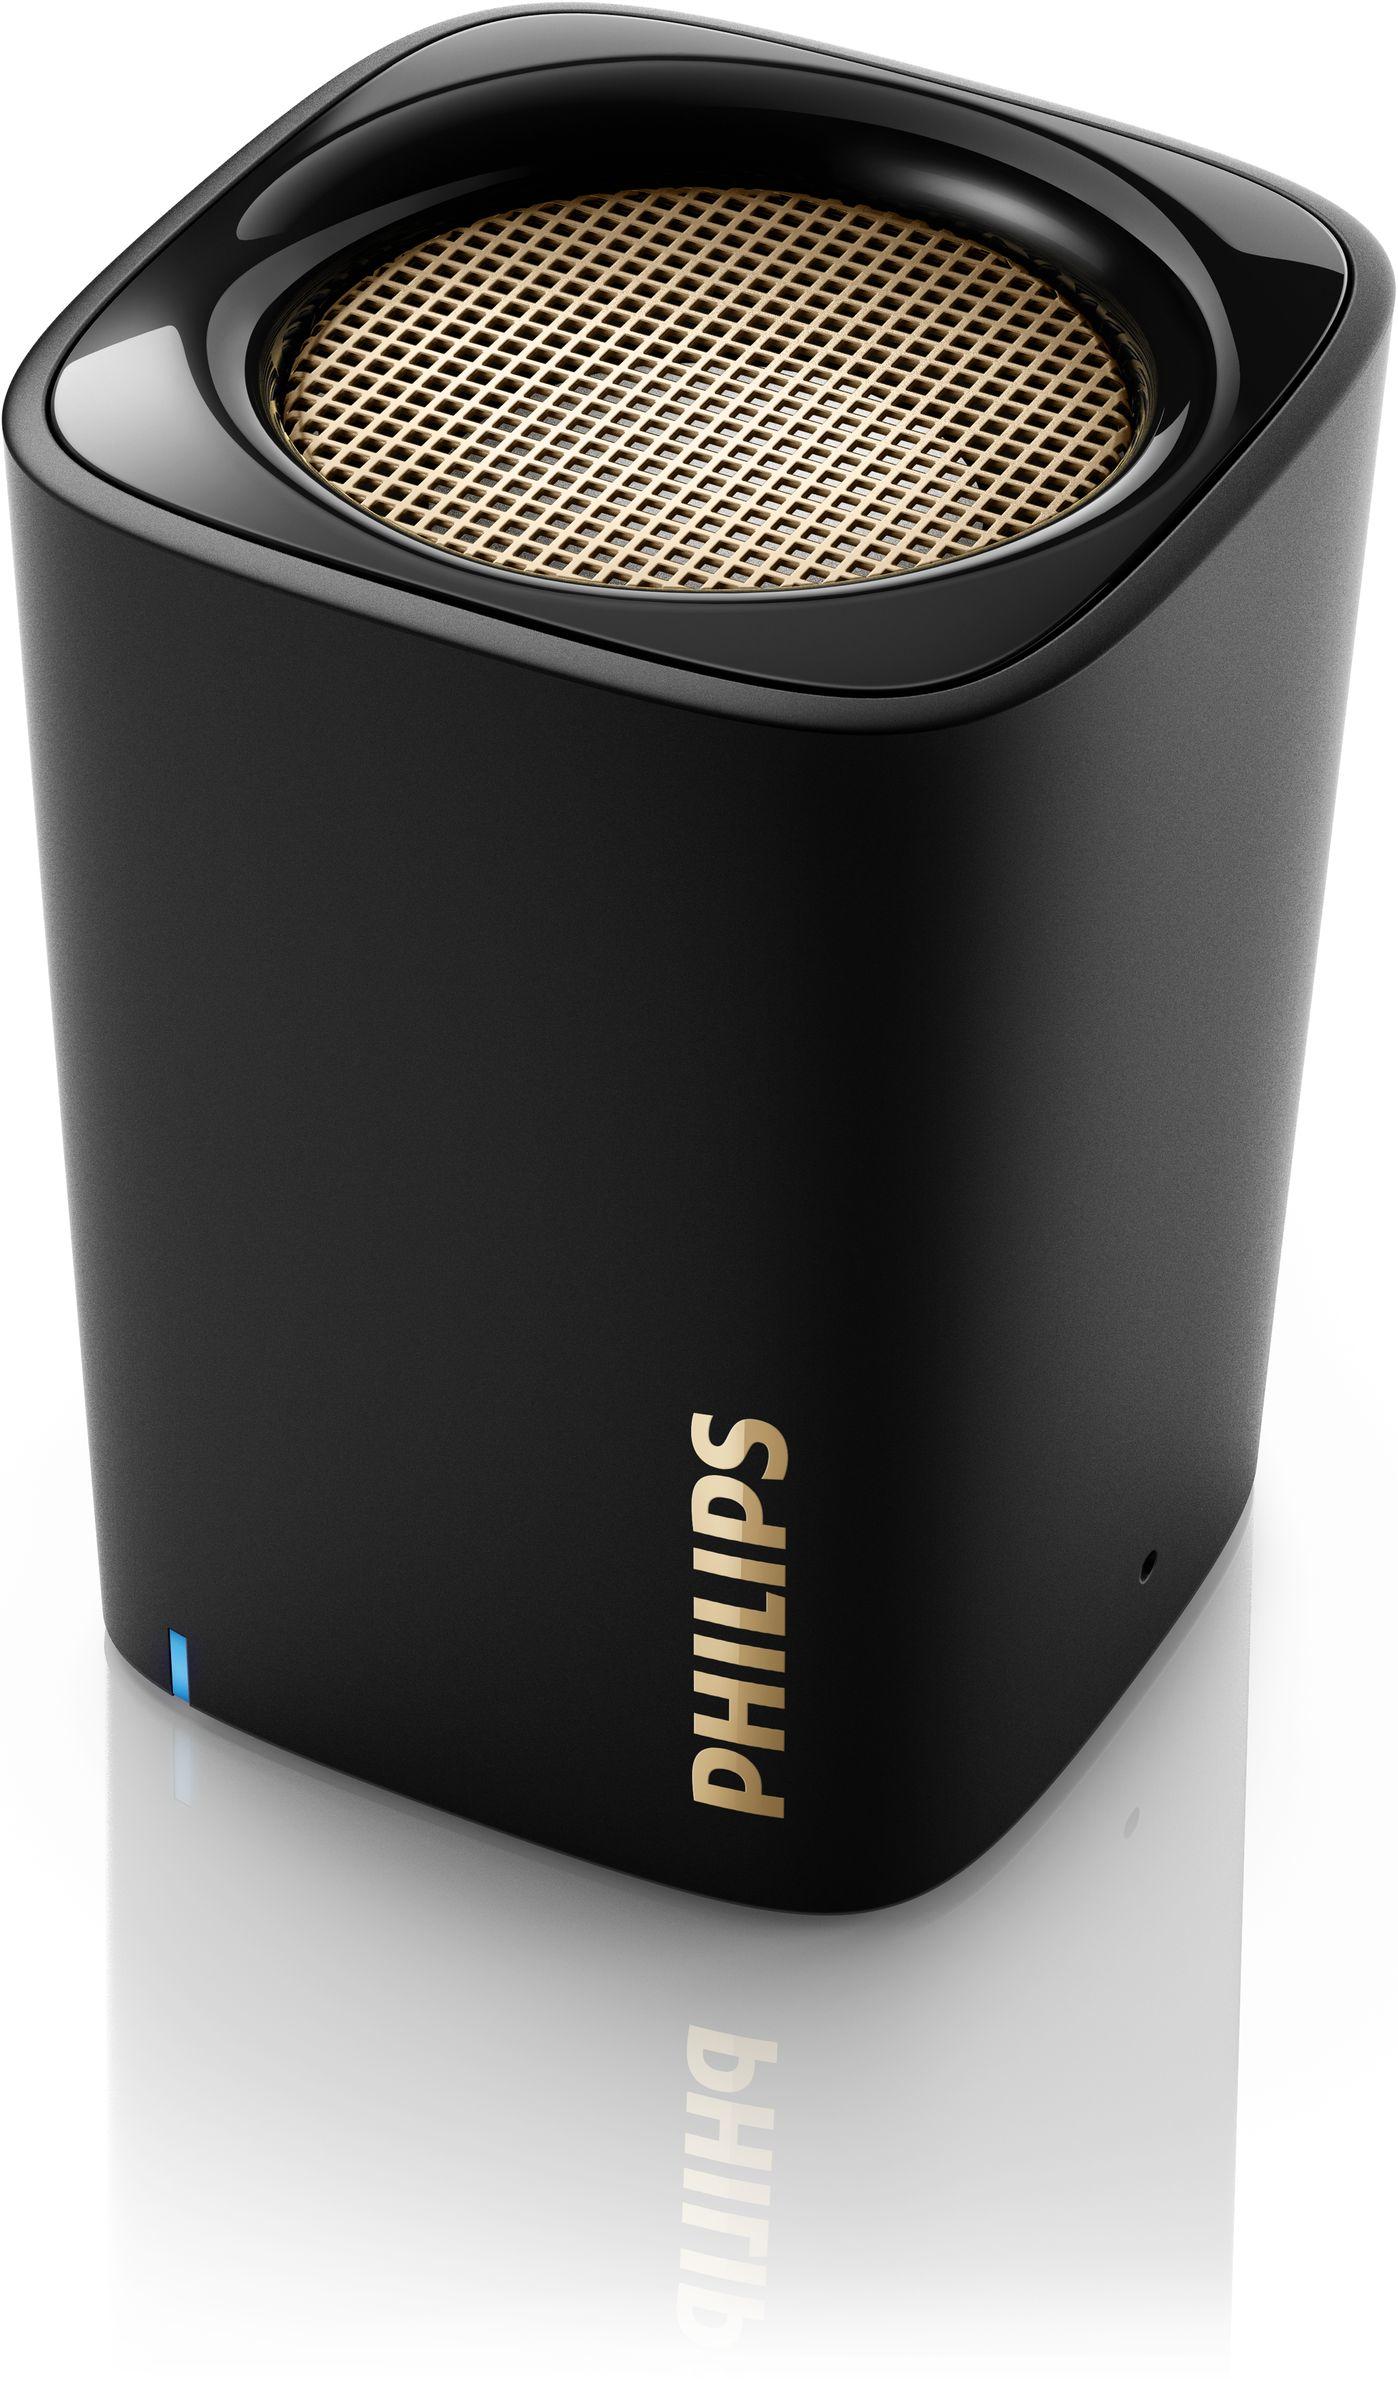 Philips altoparlante wireless portatile bt100b 00 for Cassa bluetooth philips